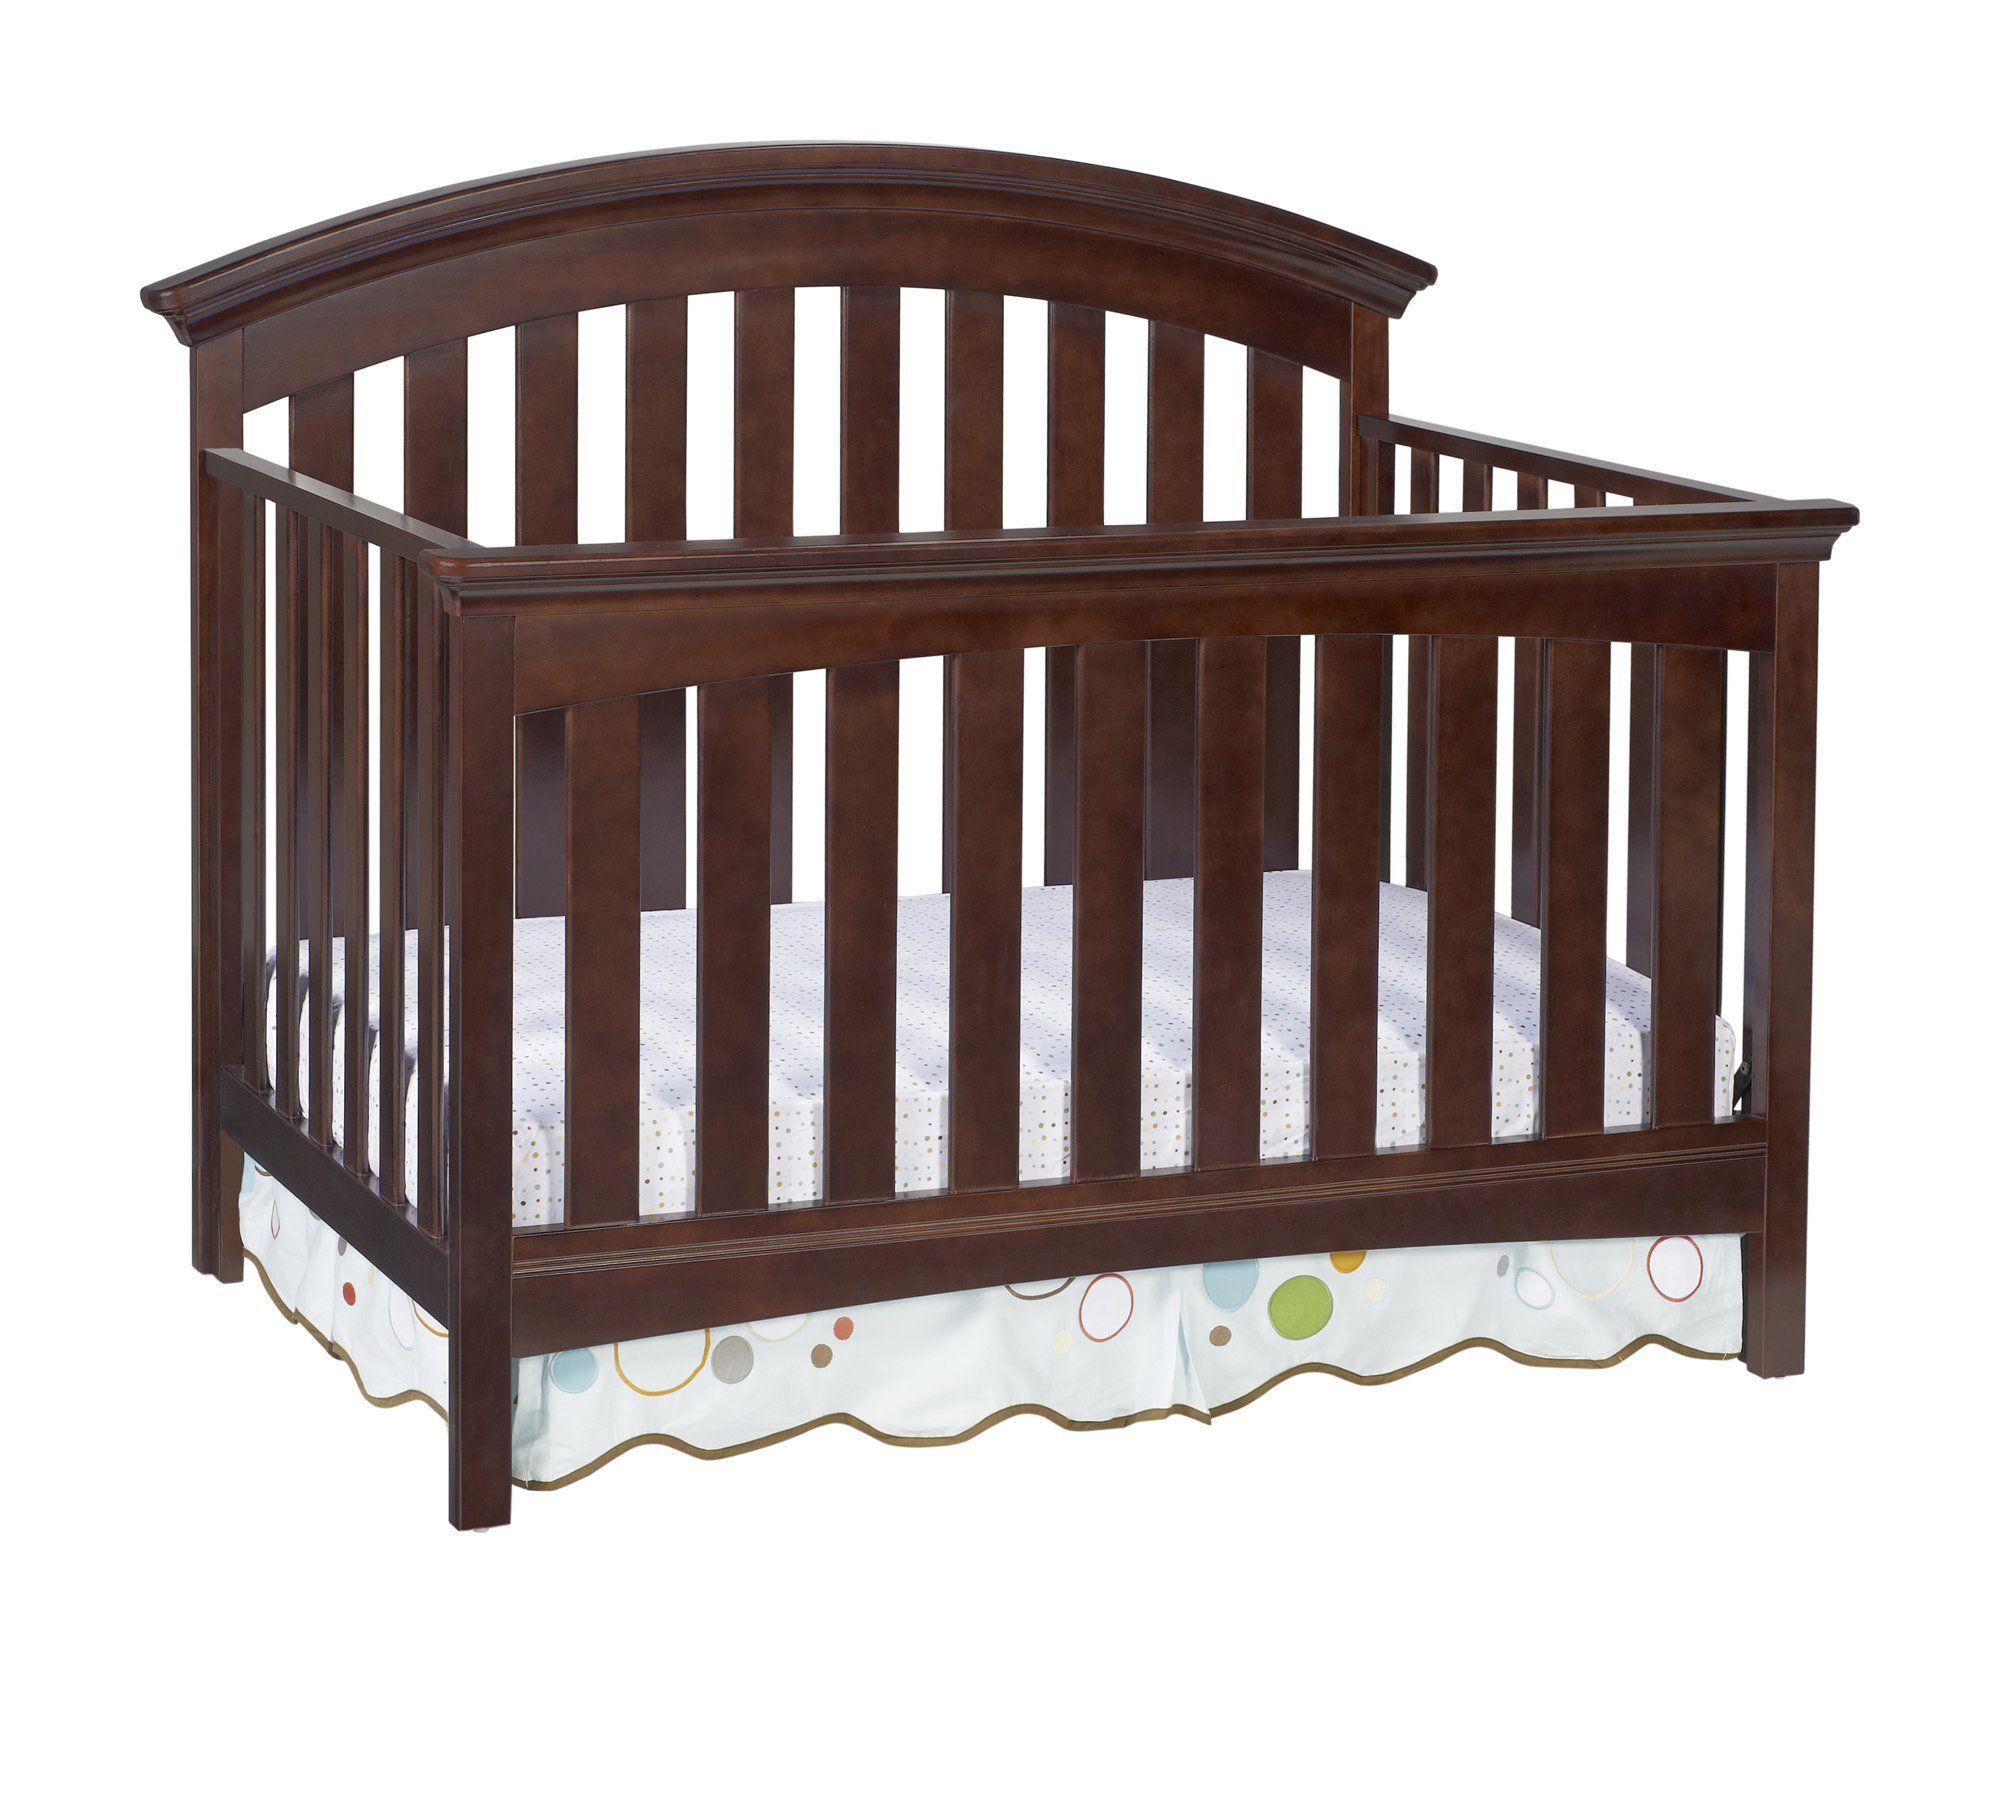 264 Delta Children S Products Bentley 4 In 1 Crib Chocolate Delta Bentley Toddler Rail Baby Cribs Convertible Crib 4 In 1 Crib